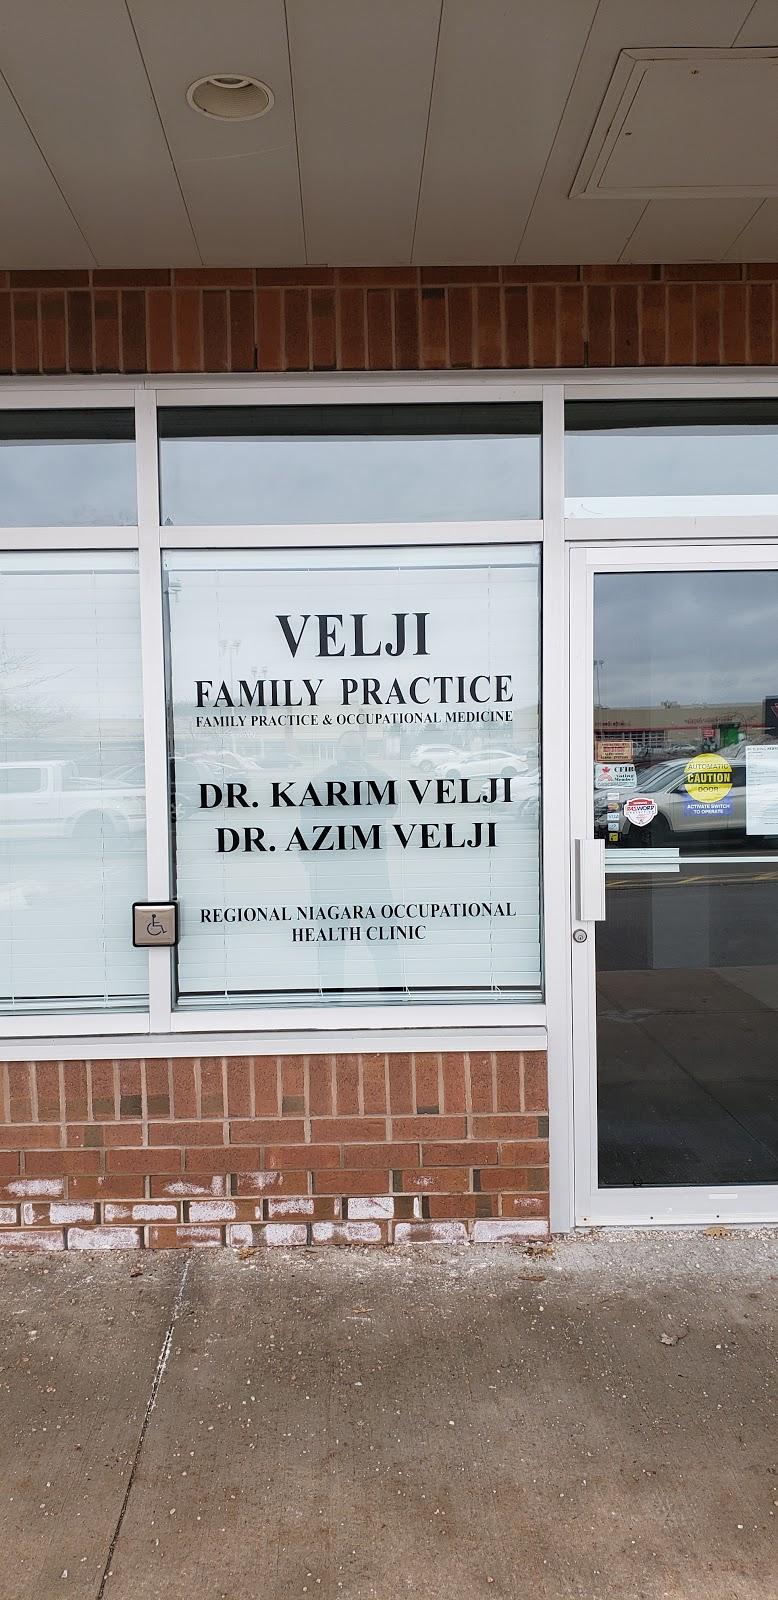 Dr. Karim Velji   doctor   3770 Montrose Rd, Niagara Falls, ON L2H 3K3, Canada   9053543777 OR +1 905-354-3777